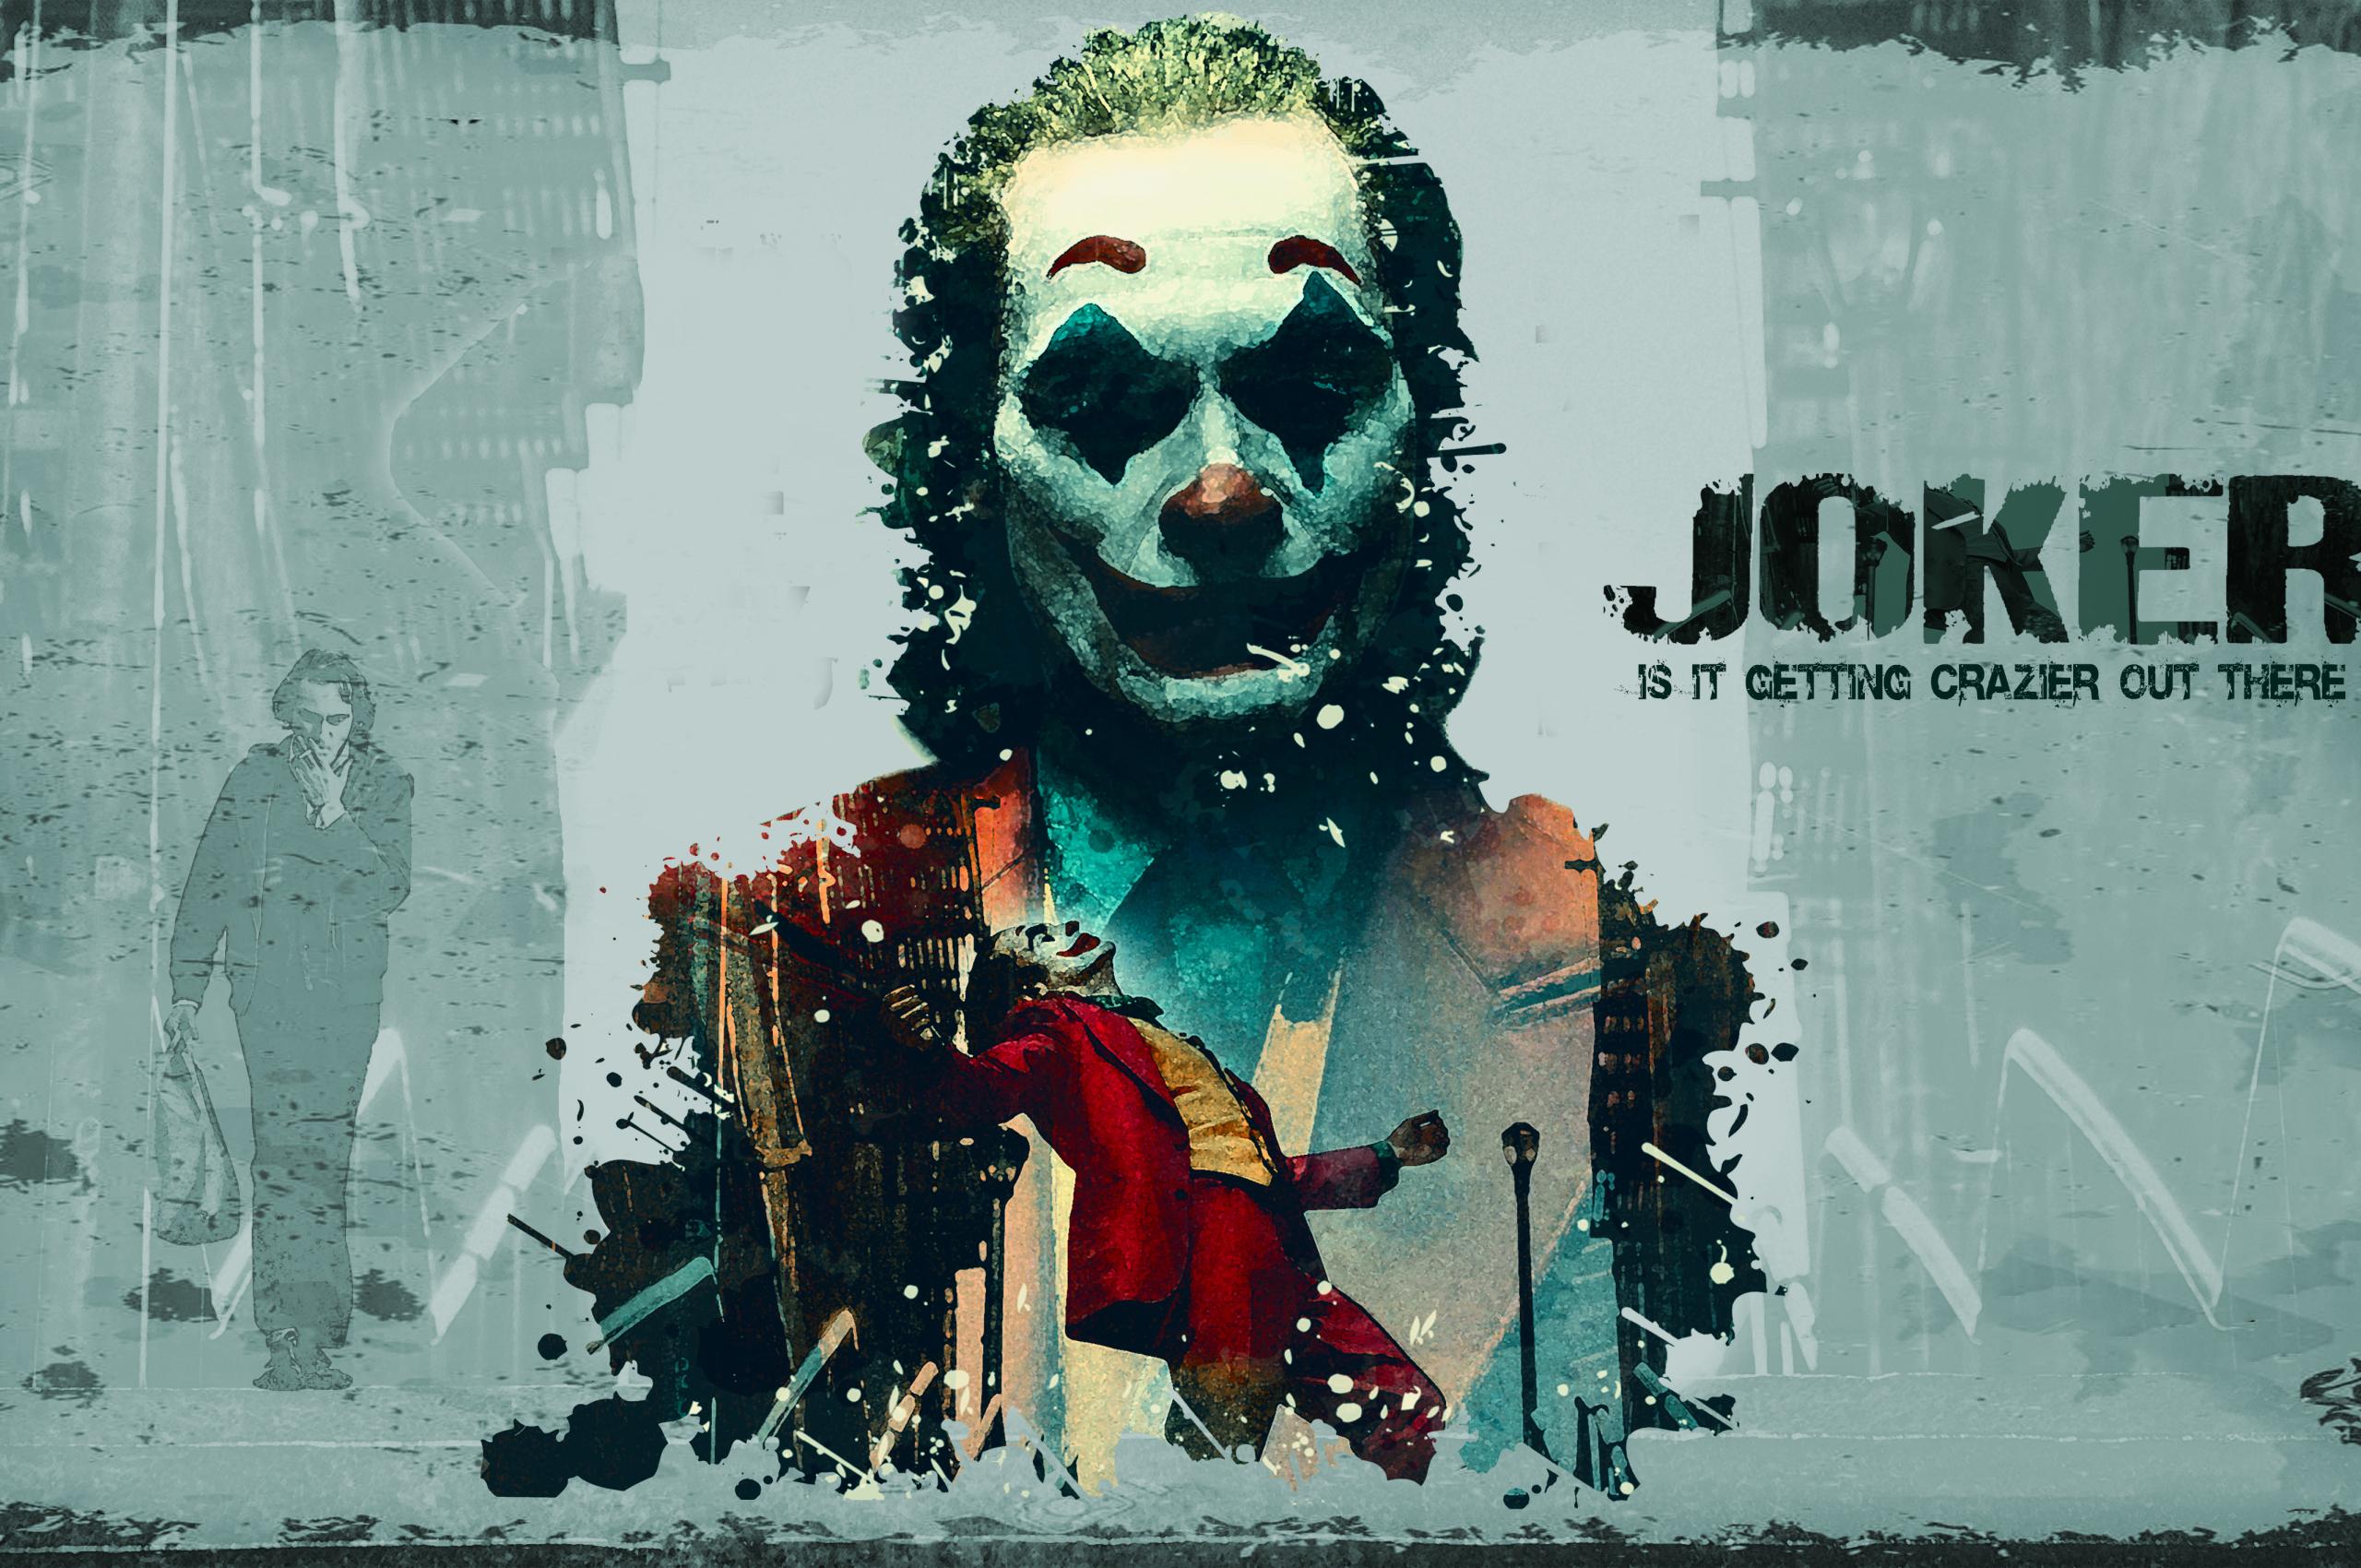 2560x1700 Joker 2019 Movie Chromebook Pixel Wallpaper, HD ...